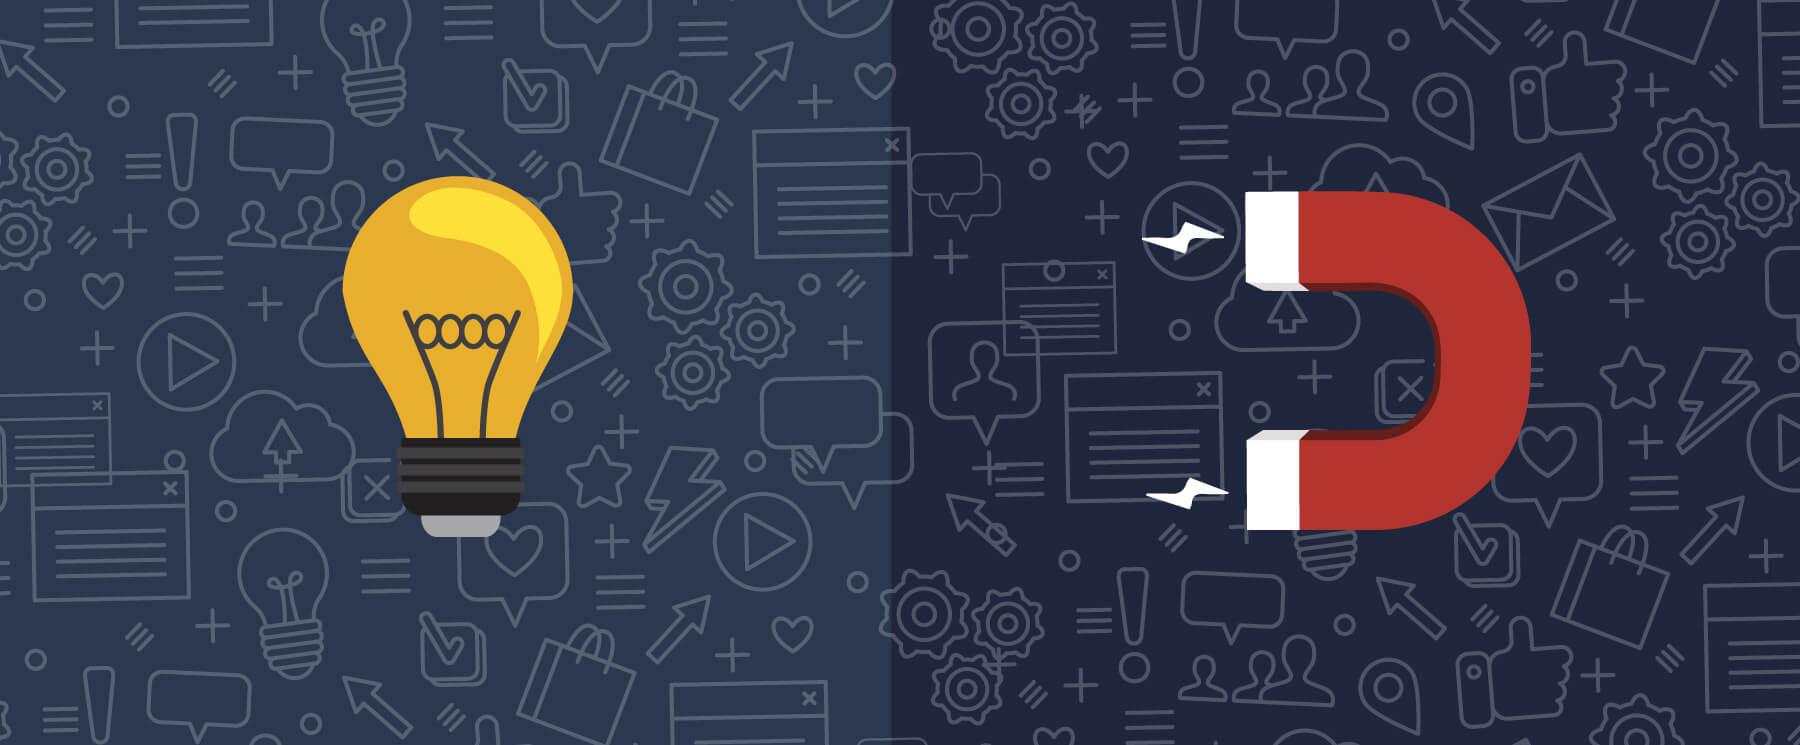 Content-Marketing-vs-Inbound-Marketing-LimeLight (2)